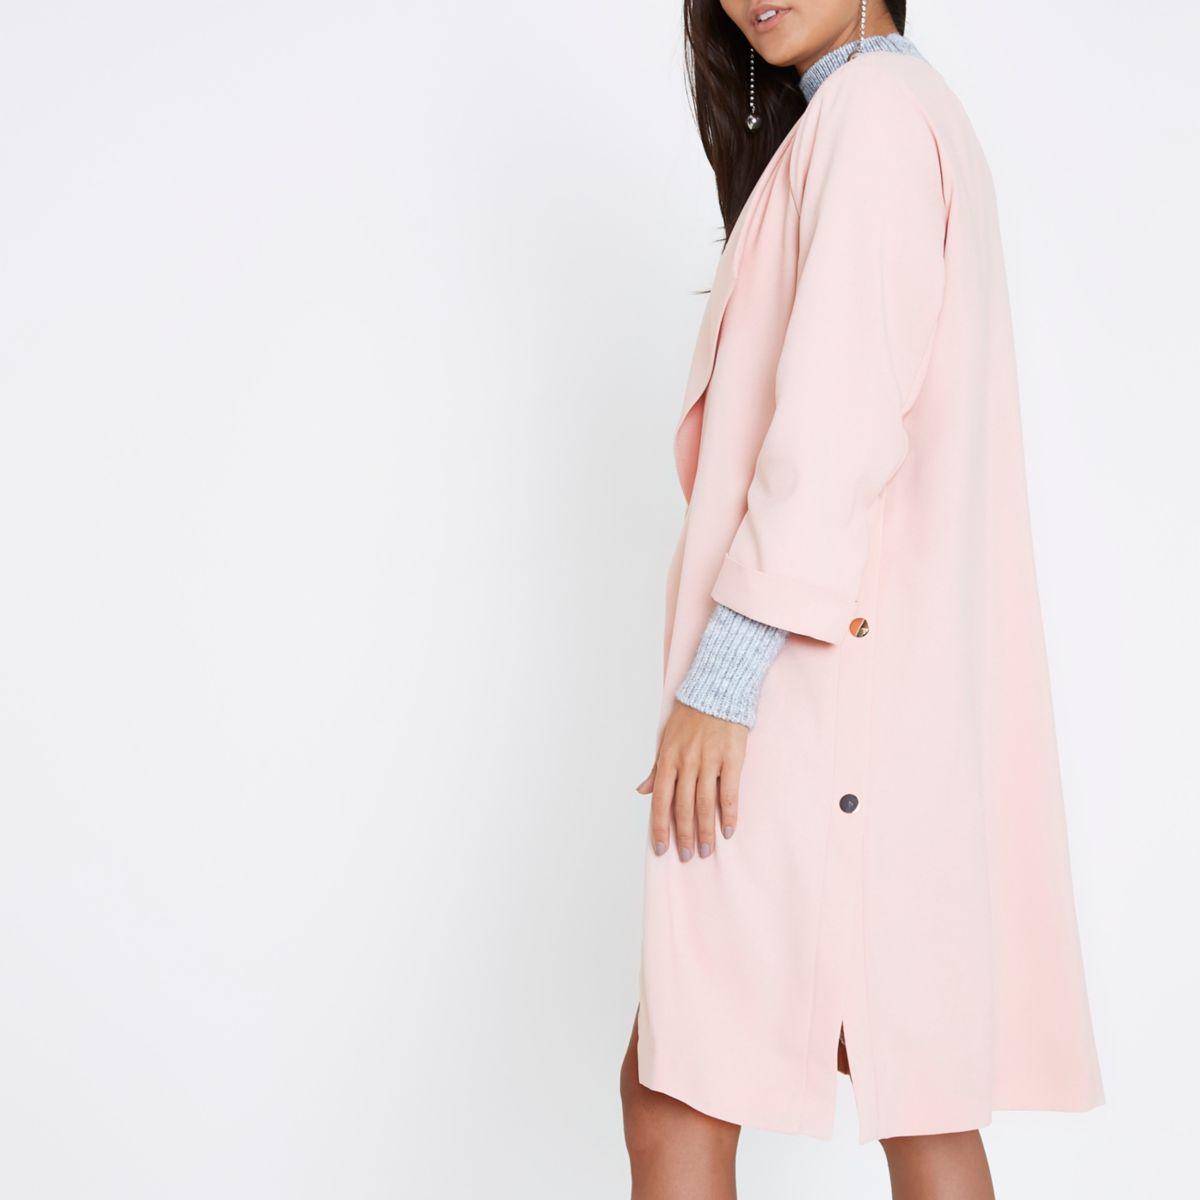 Light pink fallaway duster coat